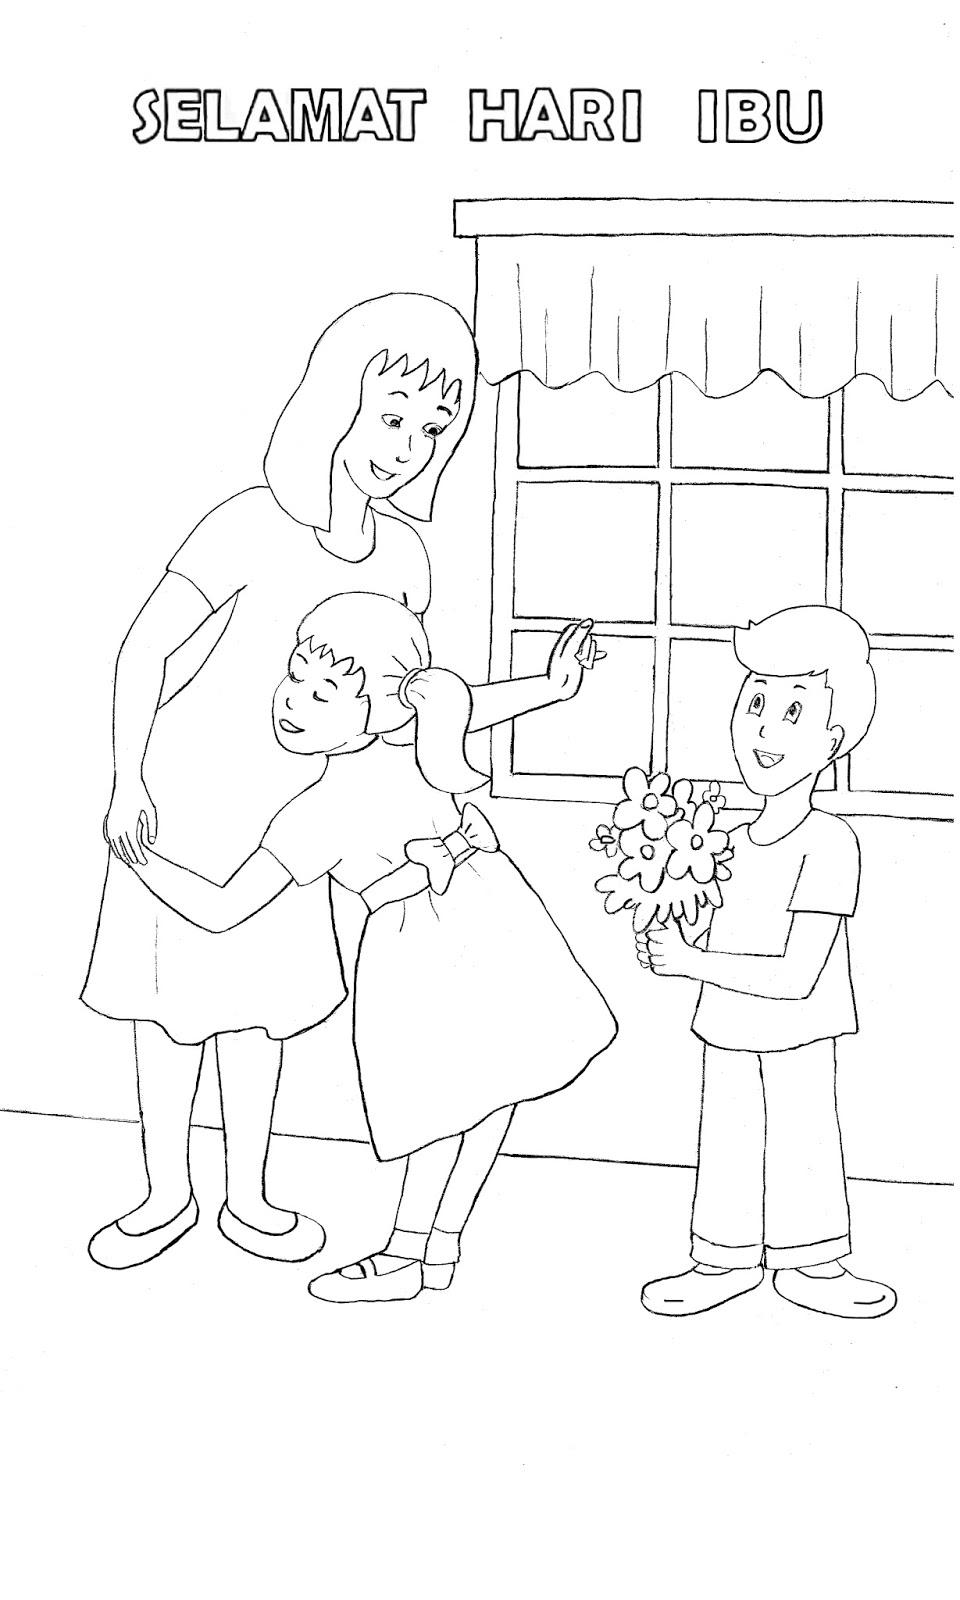 Gambar Mewarnai Selamat Hari Ibu Colouring Happy Mother s Day